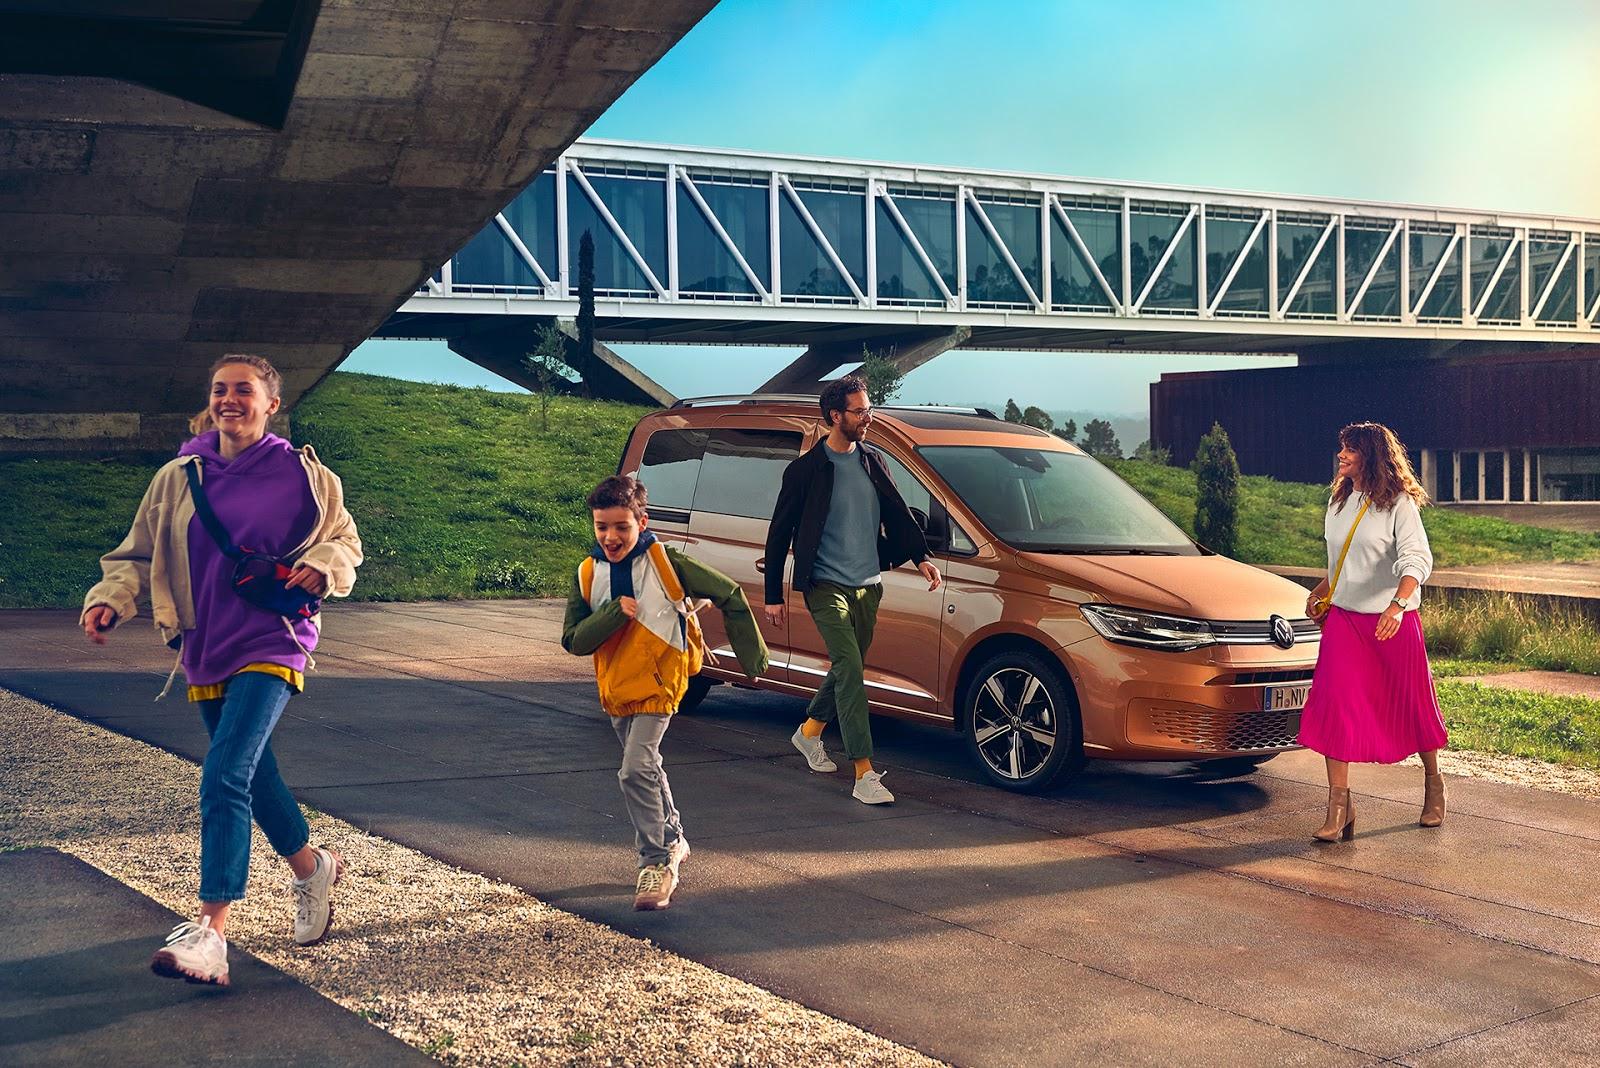 NEO2BVOLKSWAGEN2BCADDY2B5 8 1 Νέο Volkswagen Caddy 5: μεγαλύτερο, πρακτικότερο, αποδοτικότερο, εξυπνότερο Caddy, MPV, Volkswagen, Volkswagen Caddy, VW, VW Caddy, ειδήσεις, Επαγγελματικά